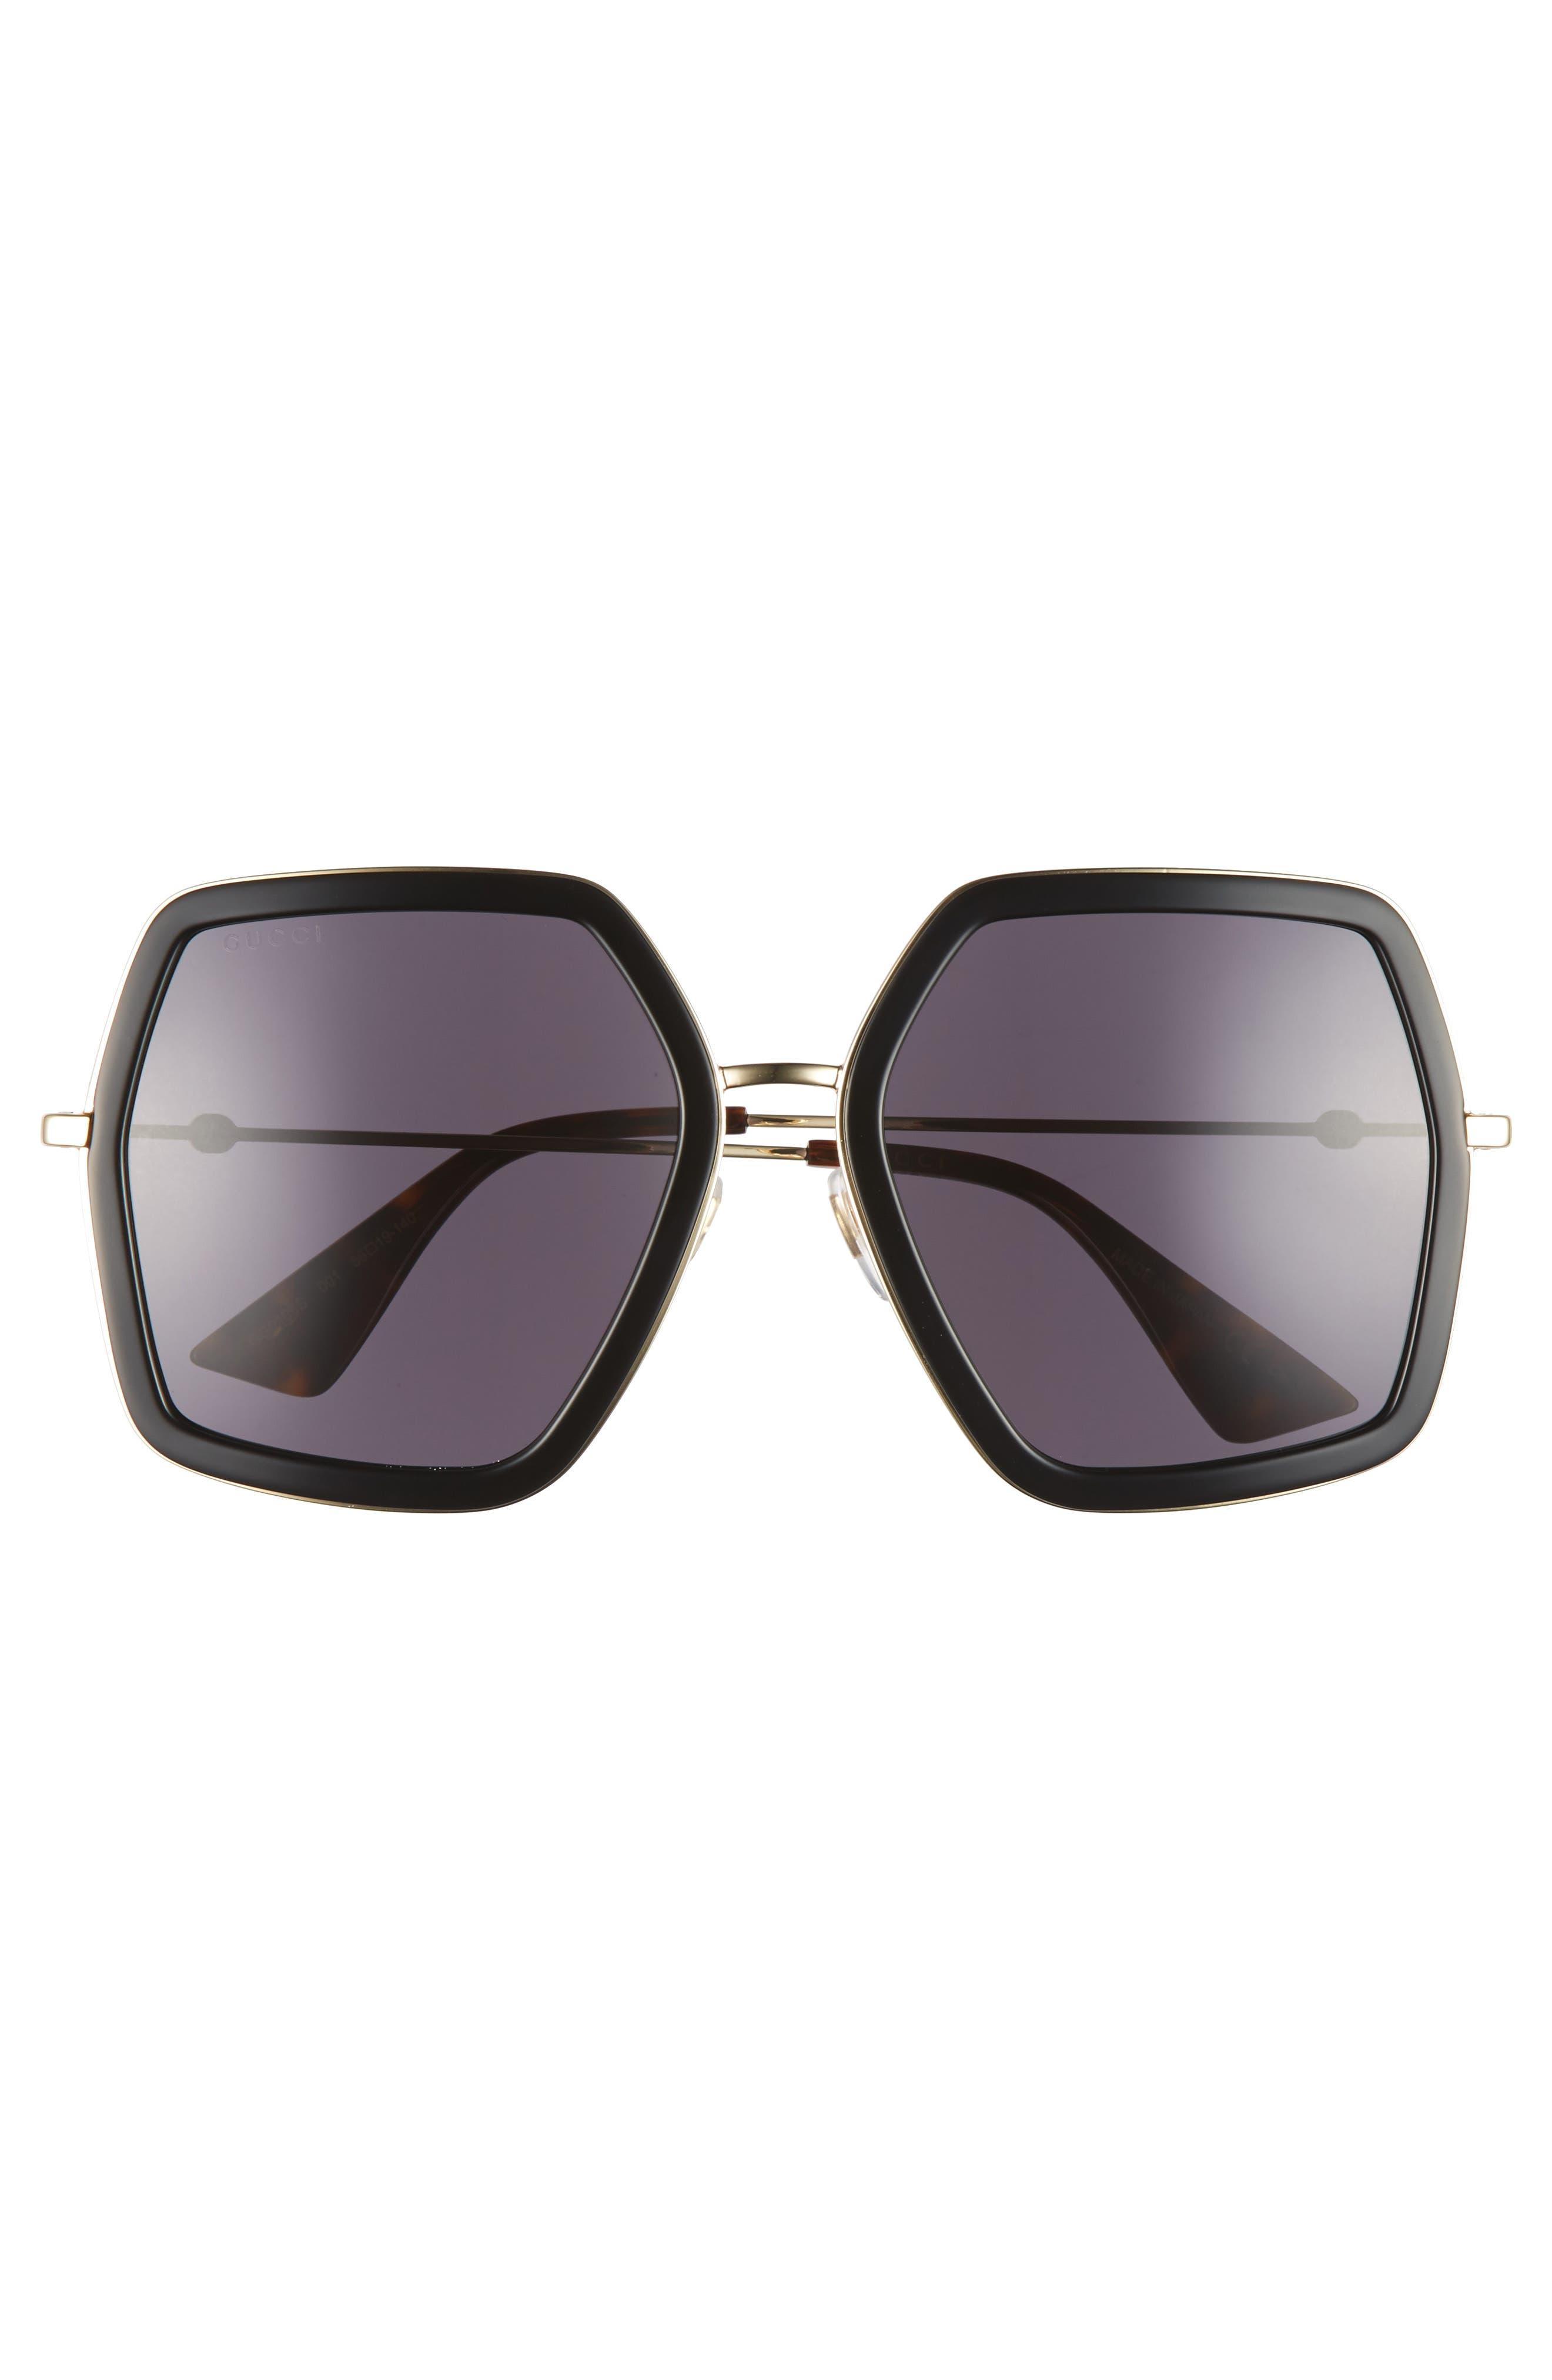 56mm Sunglasses,                             Alternate thumbnail 3, color,                             Black/ Grey